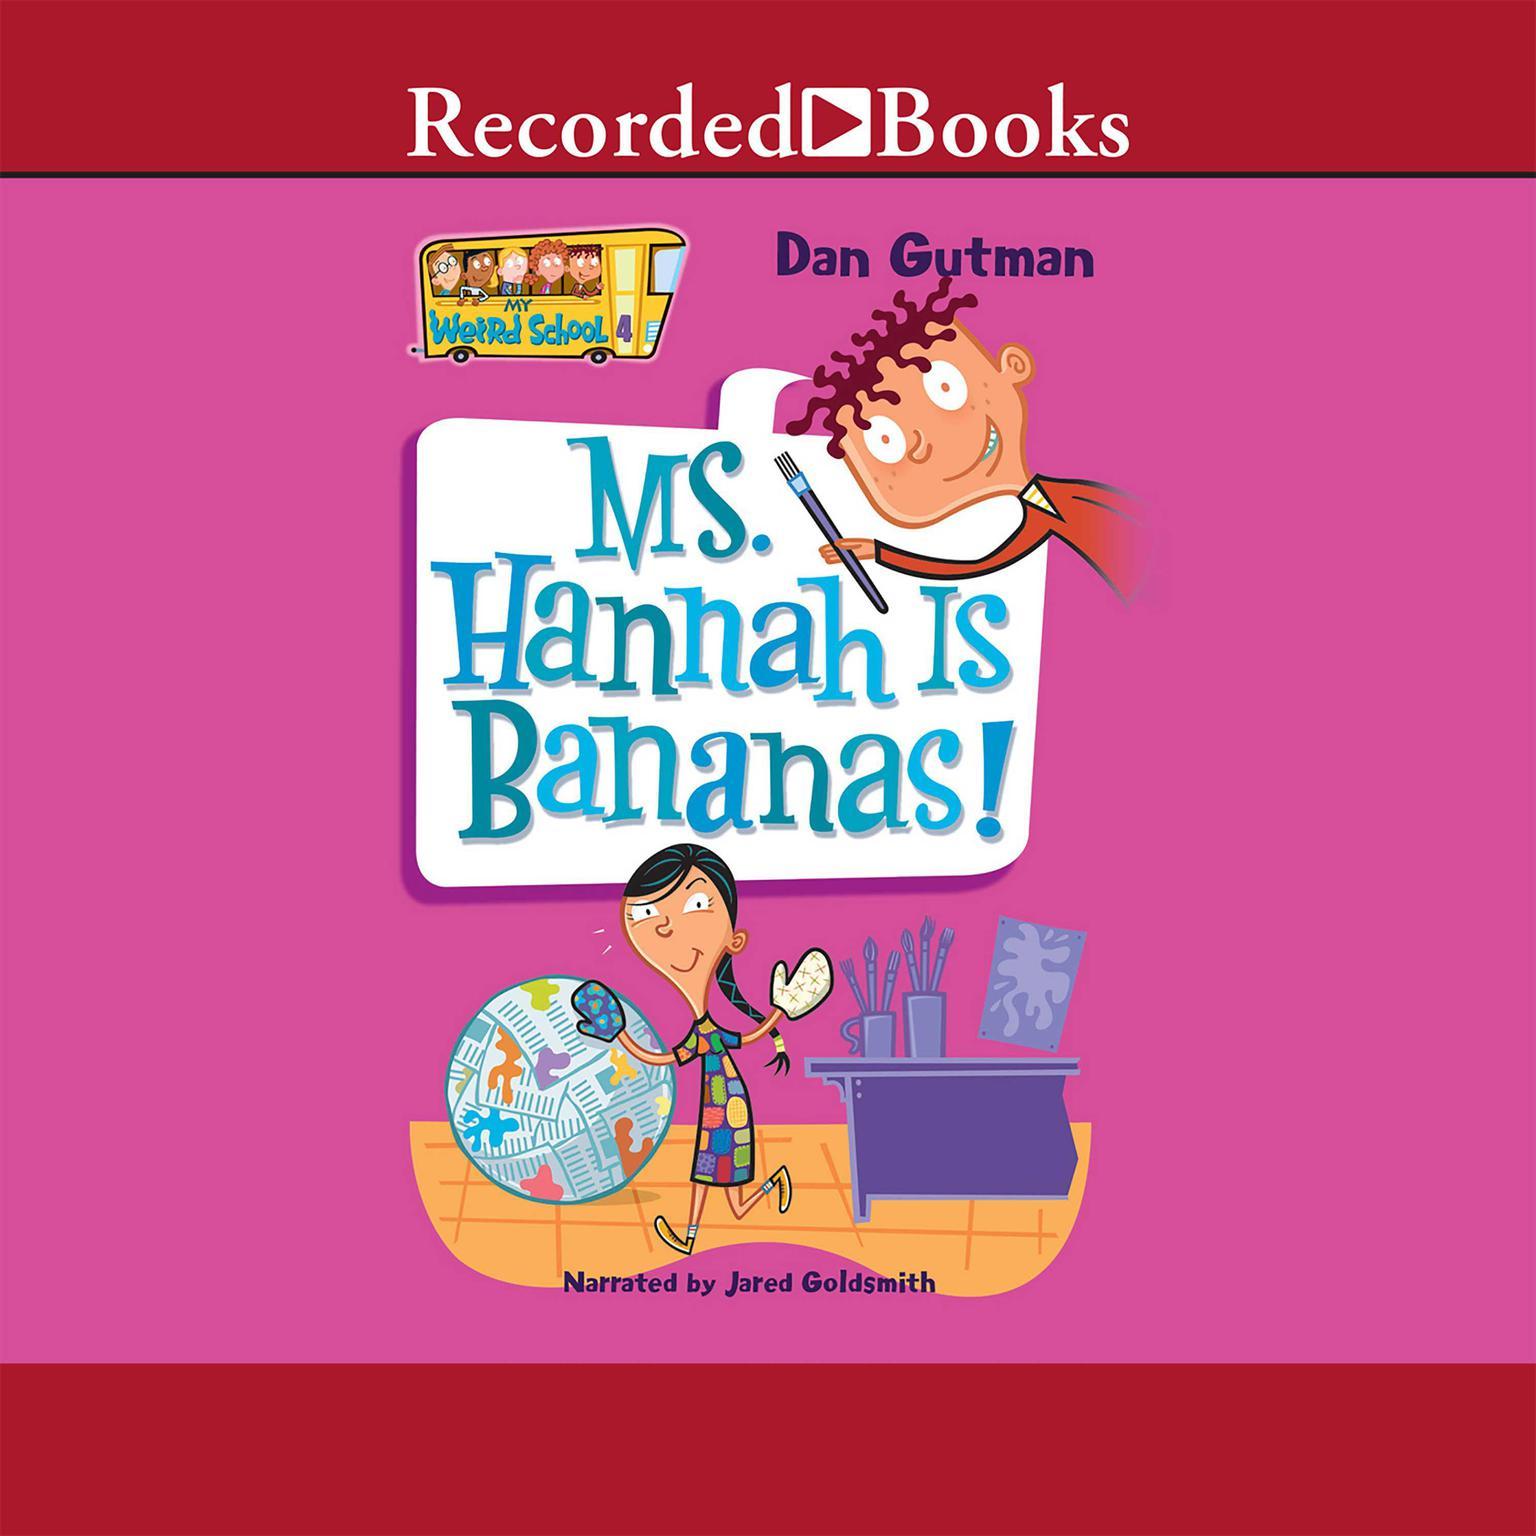 Ms. Hannah is Bananas Audiobook, by Dan Gutman